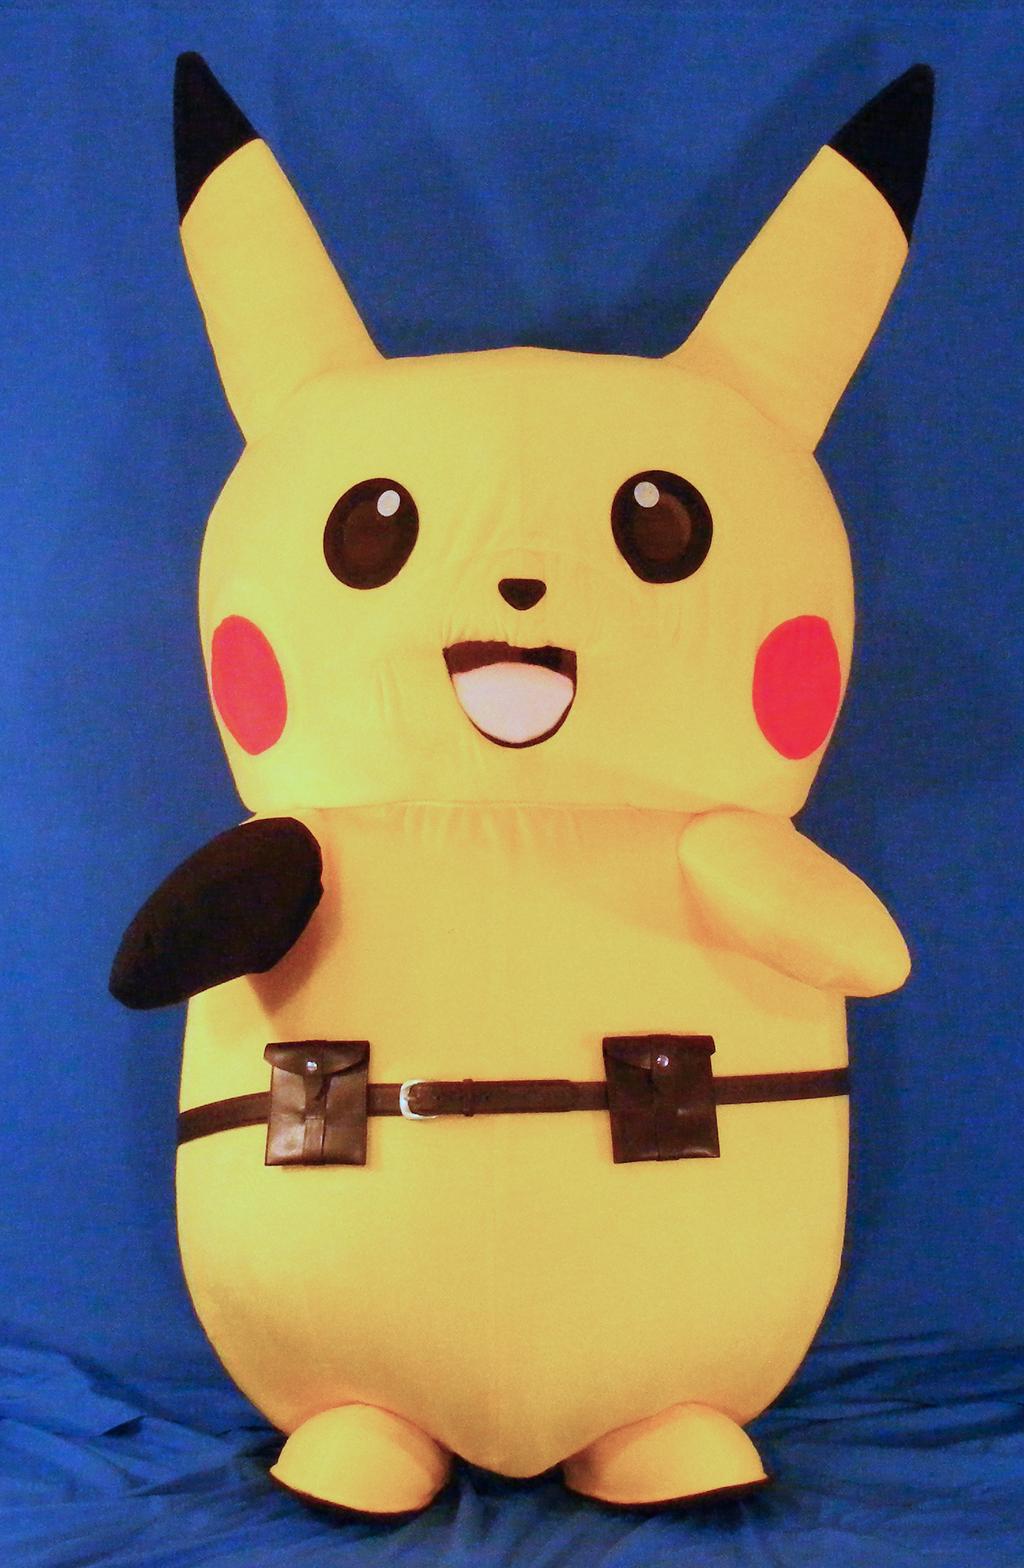 Pikachu Mascot Suit (Ace Spade Style)